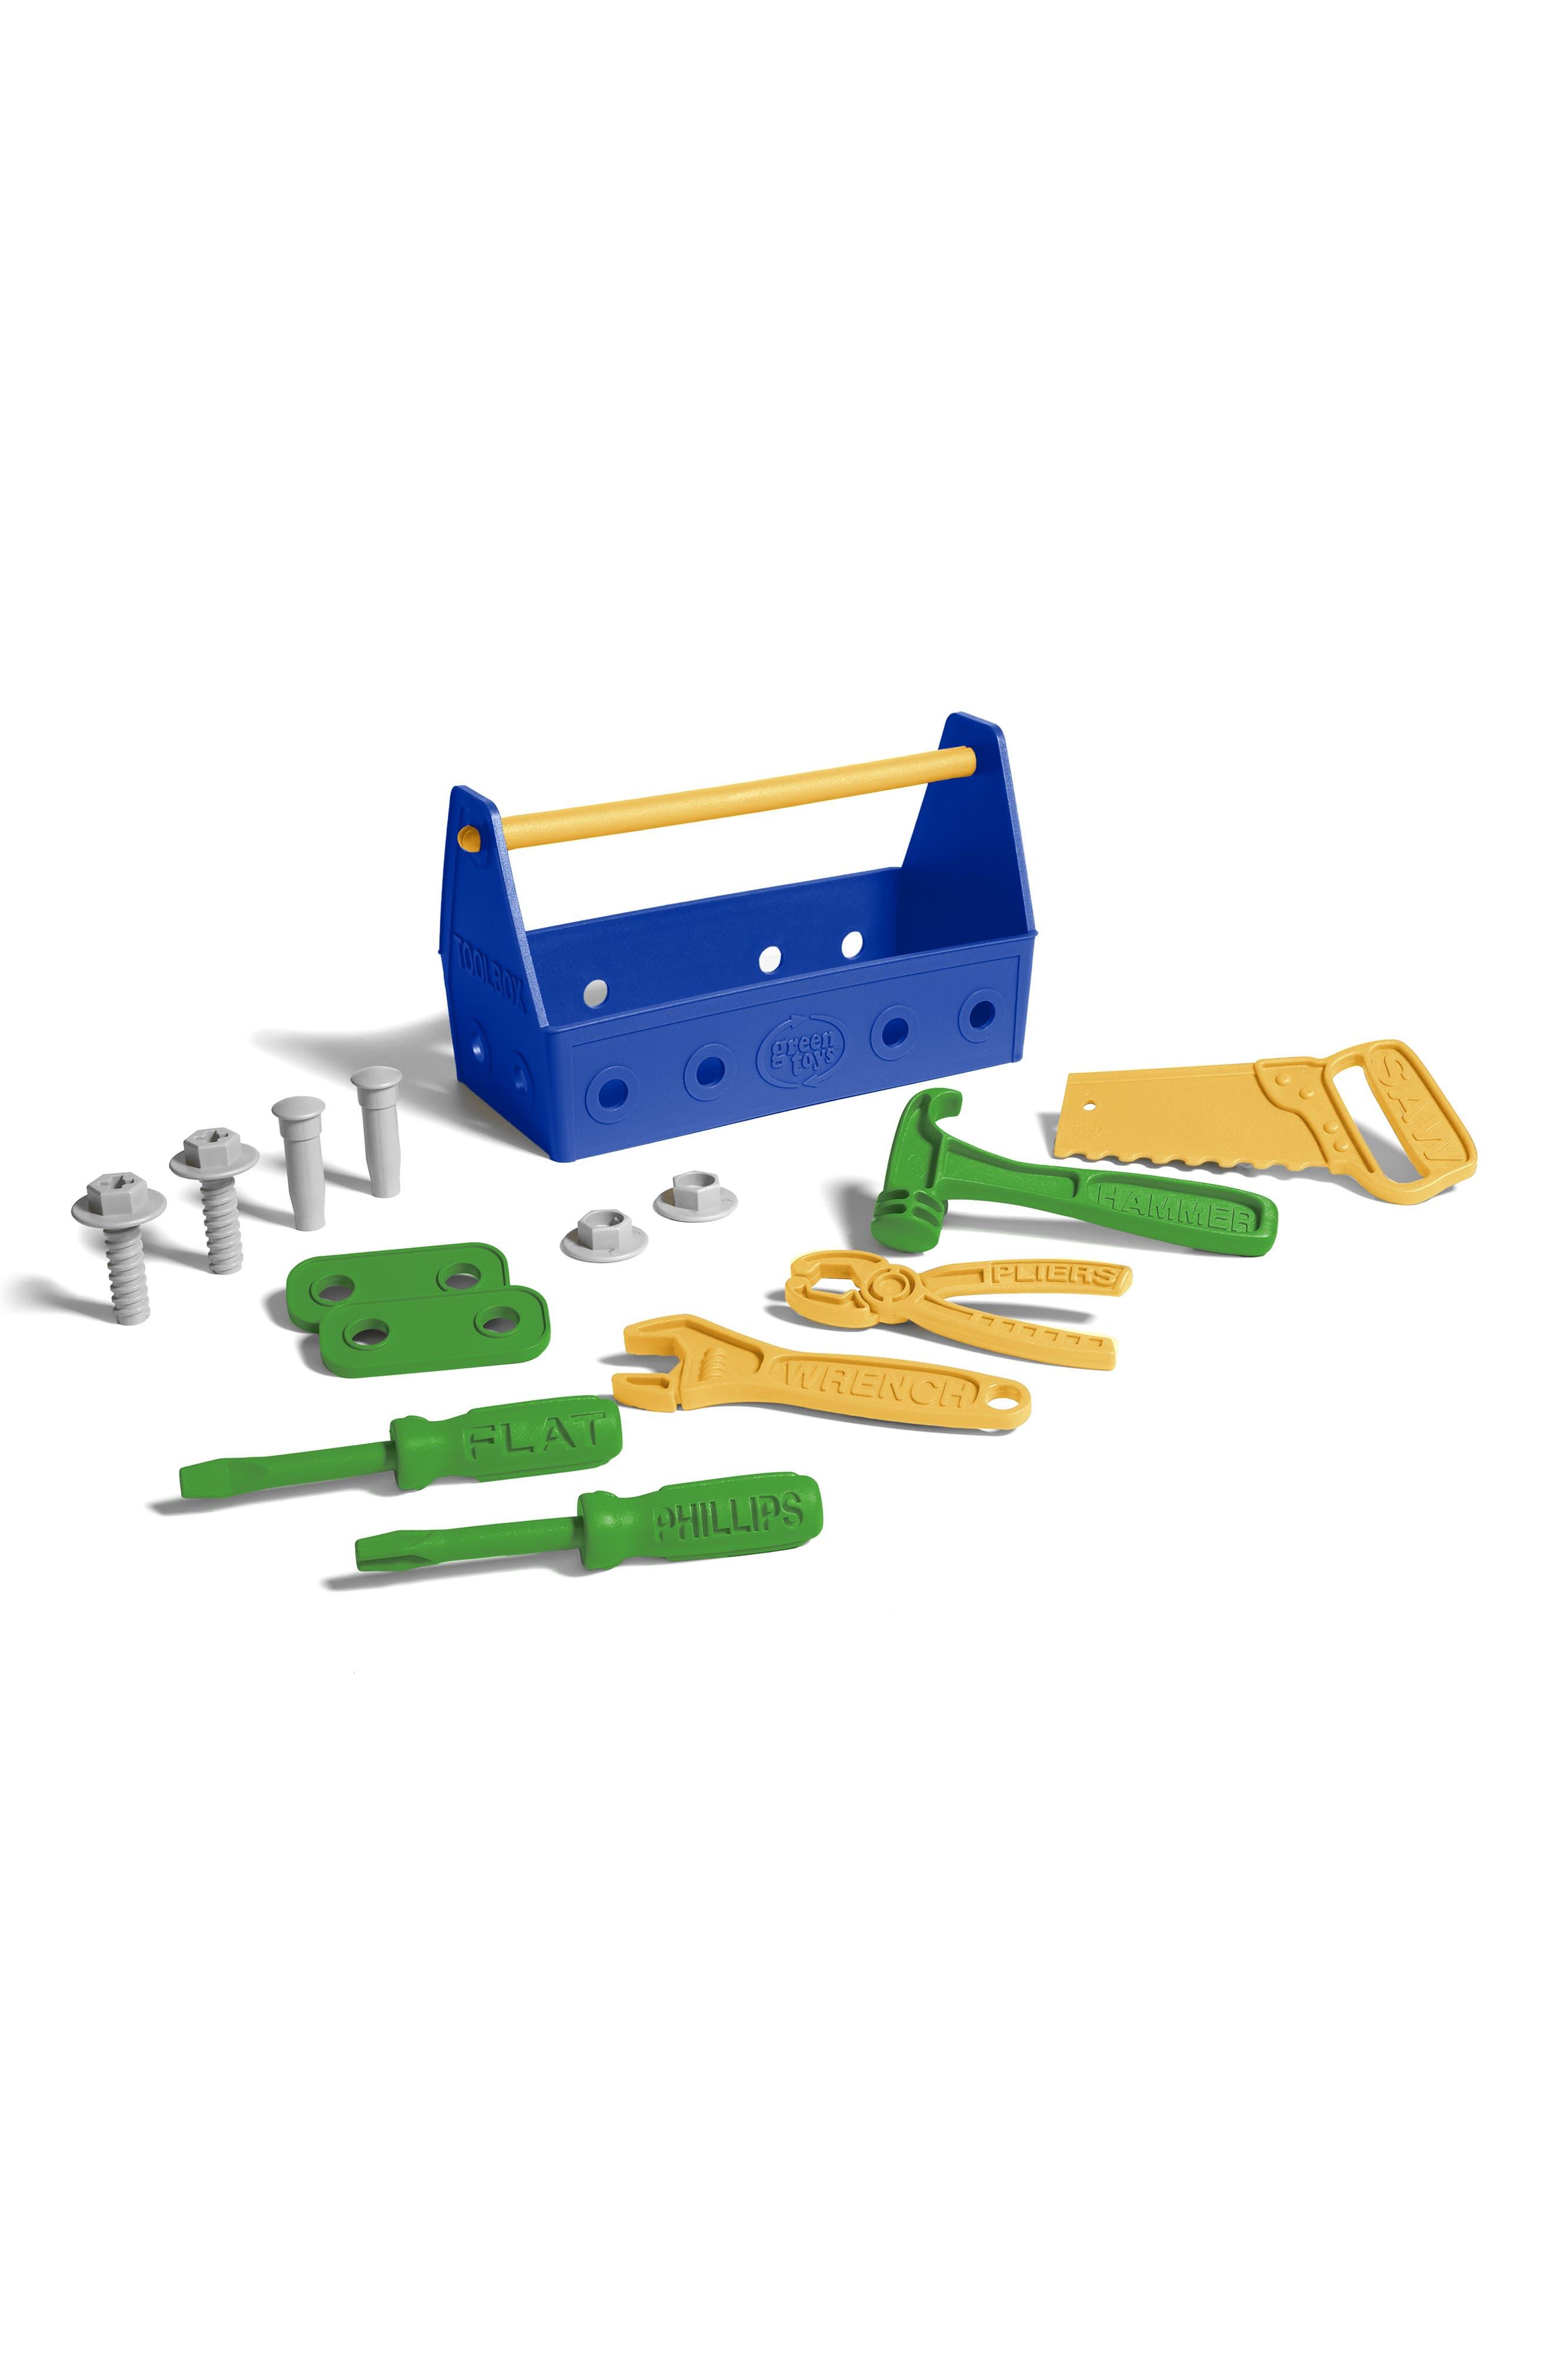 15-Piece Plastic Tool Set,                             Alternate thumbnail 2, color,                             Blue